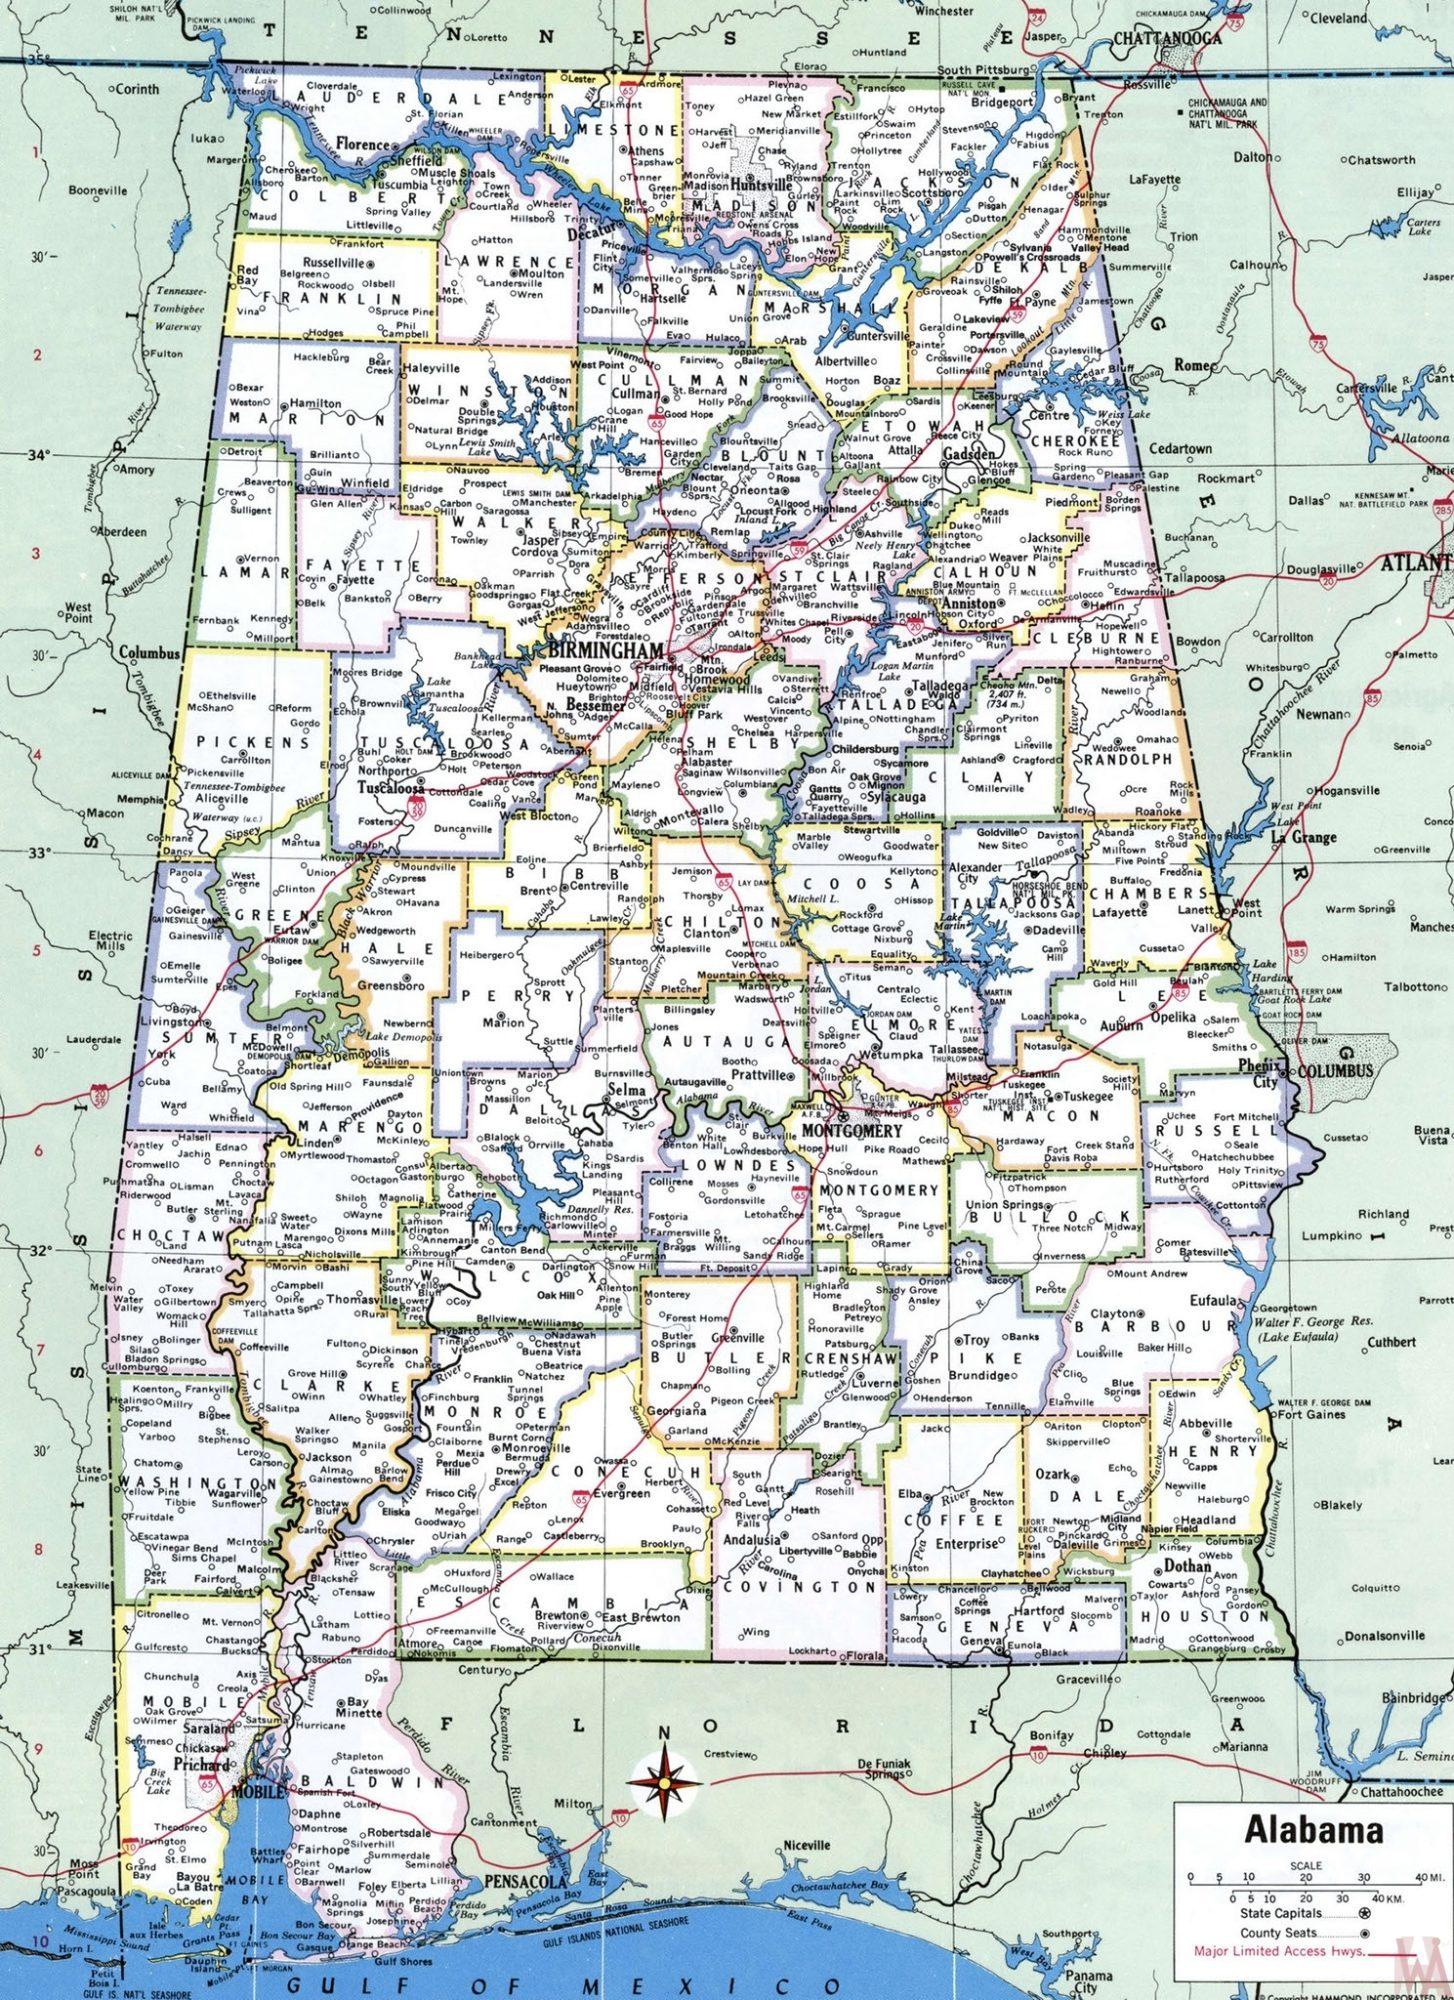 Political Map Of Alabama.Alabama Political Map Political Map Of Alabama With Capital City